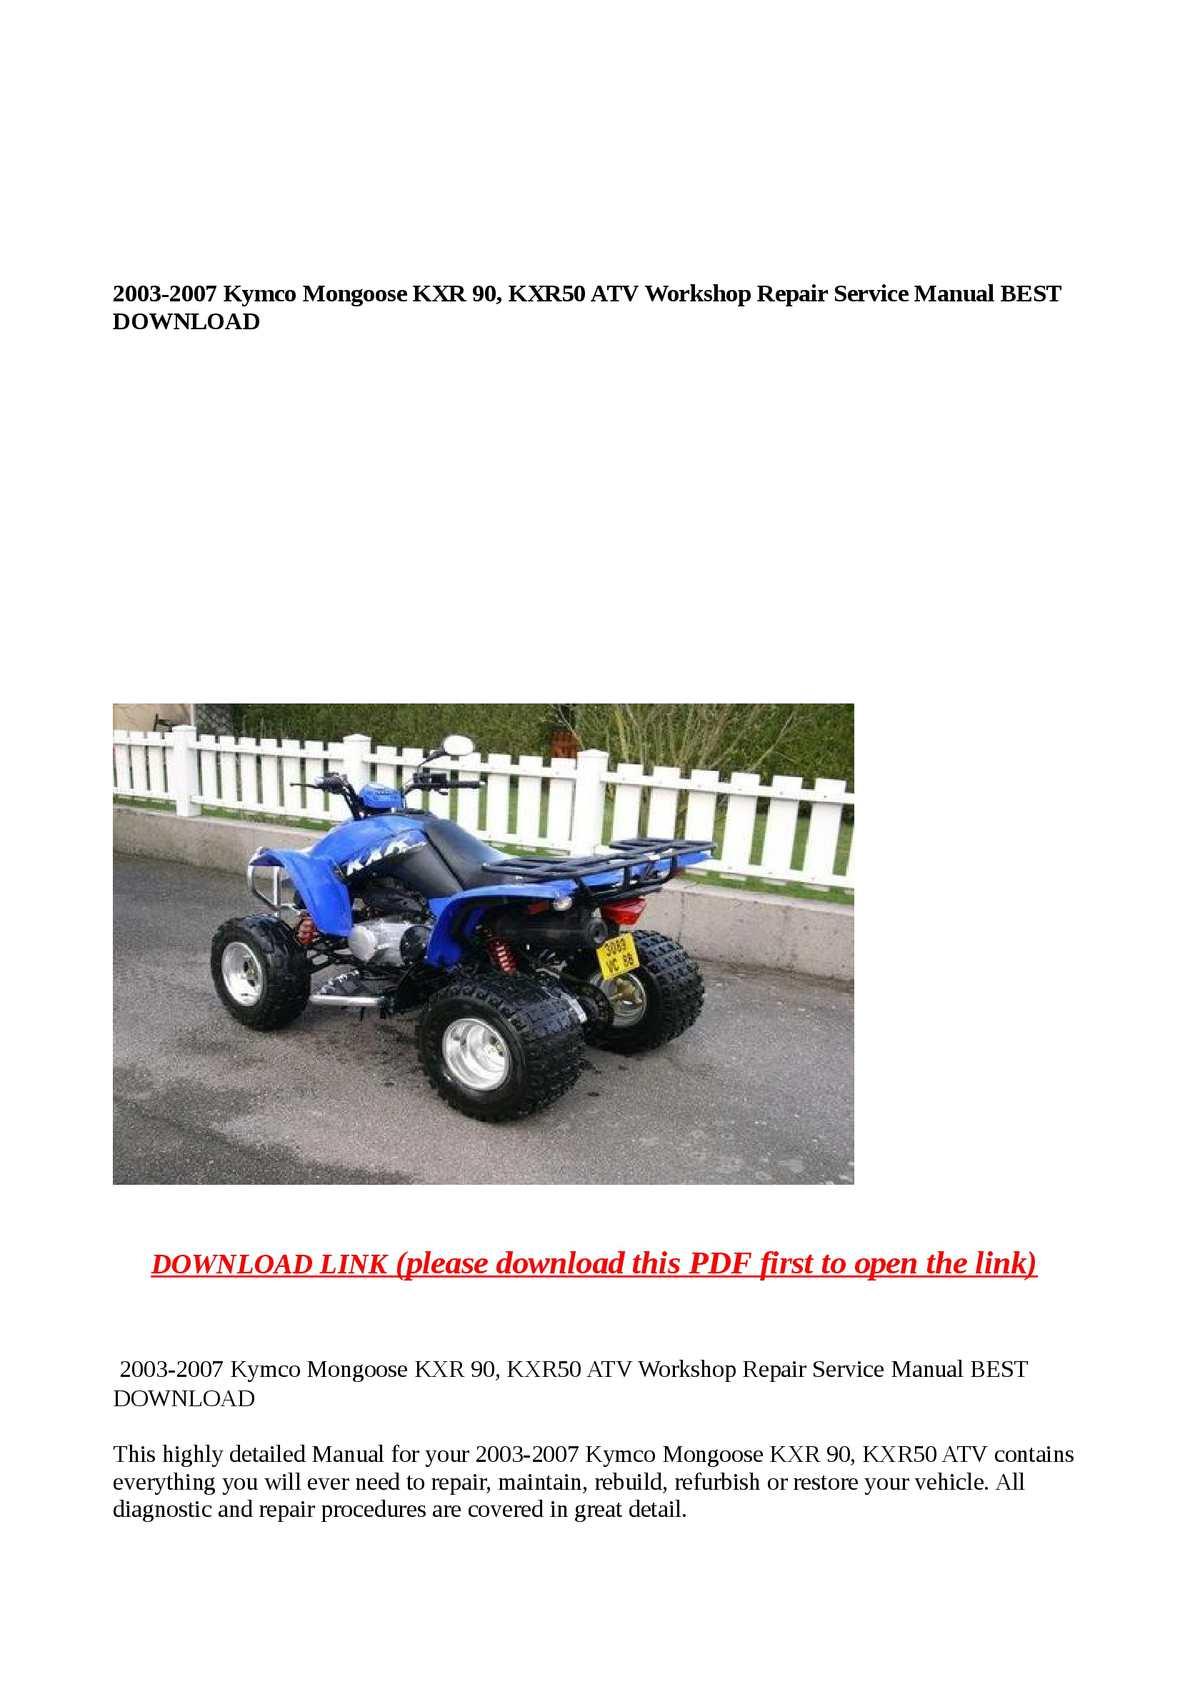 Calaméo - 2003-2007 Kymco Mongoose KXR 90, KXR50 ATV Workshop Repair  Service Manual BEST DOWNLOAD